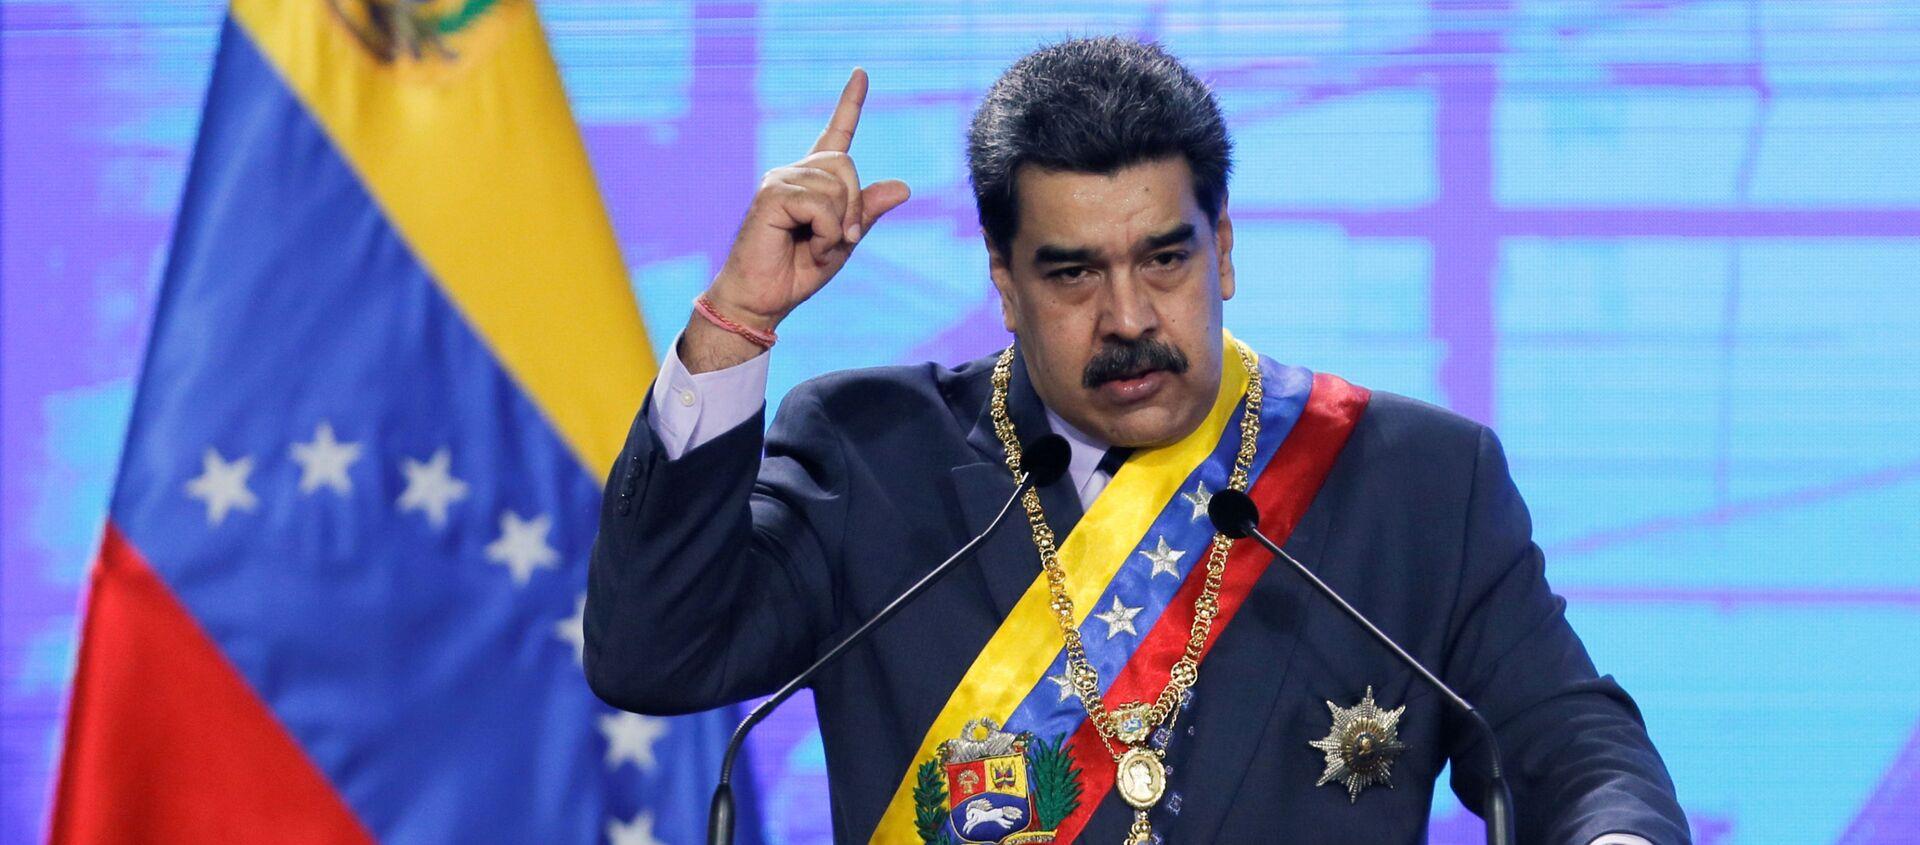 Venezuela's President Nicolas Maduro speaks during a ceremony marking the opening of the new court term in Caracas, Venezuela January 22, 2021. - Sputnik International, 1920